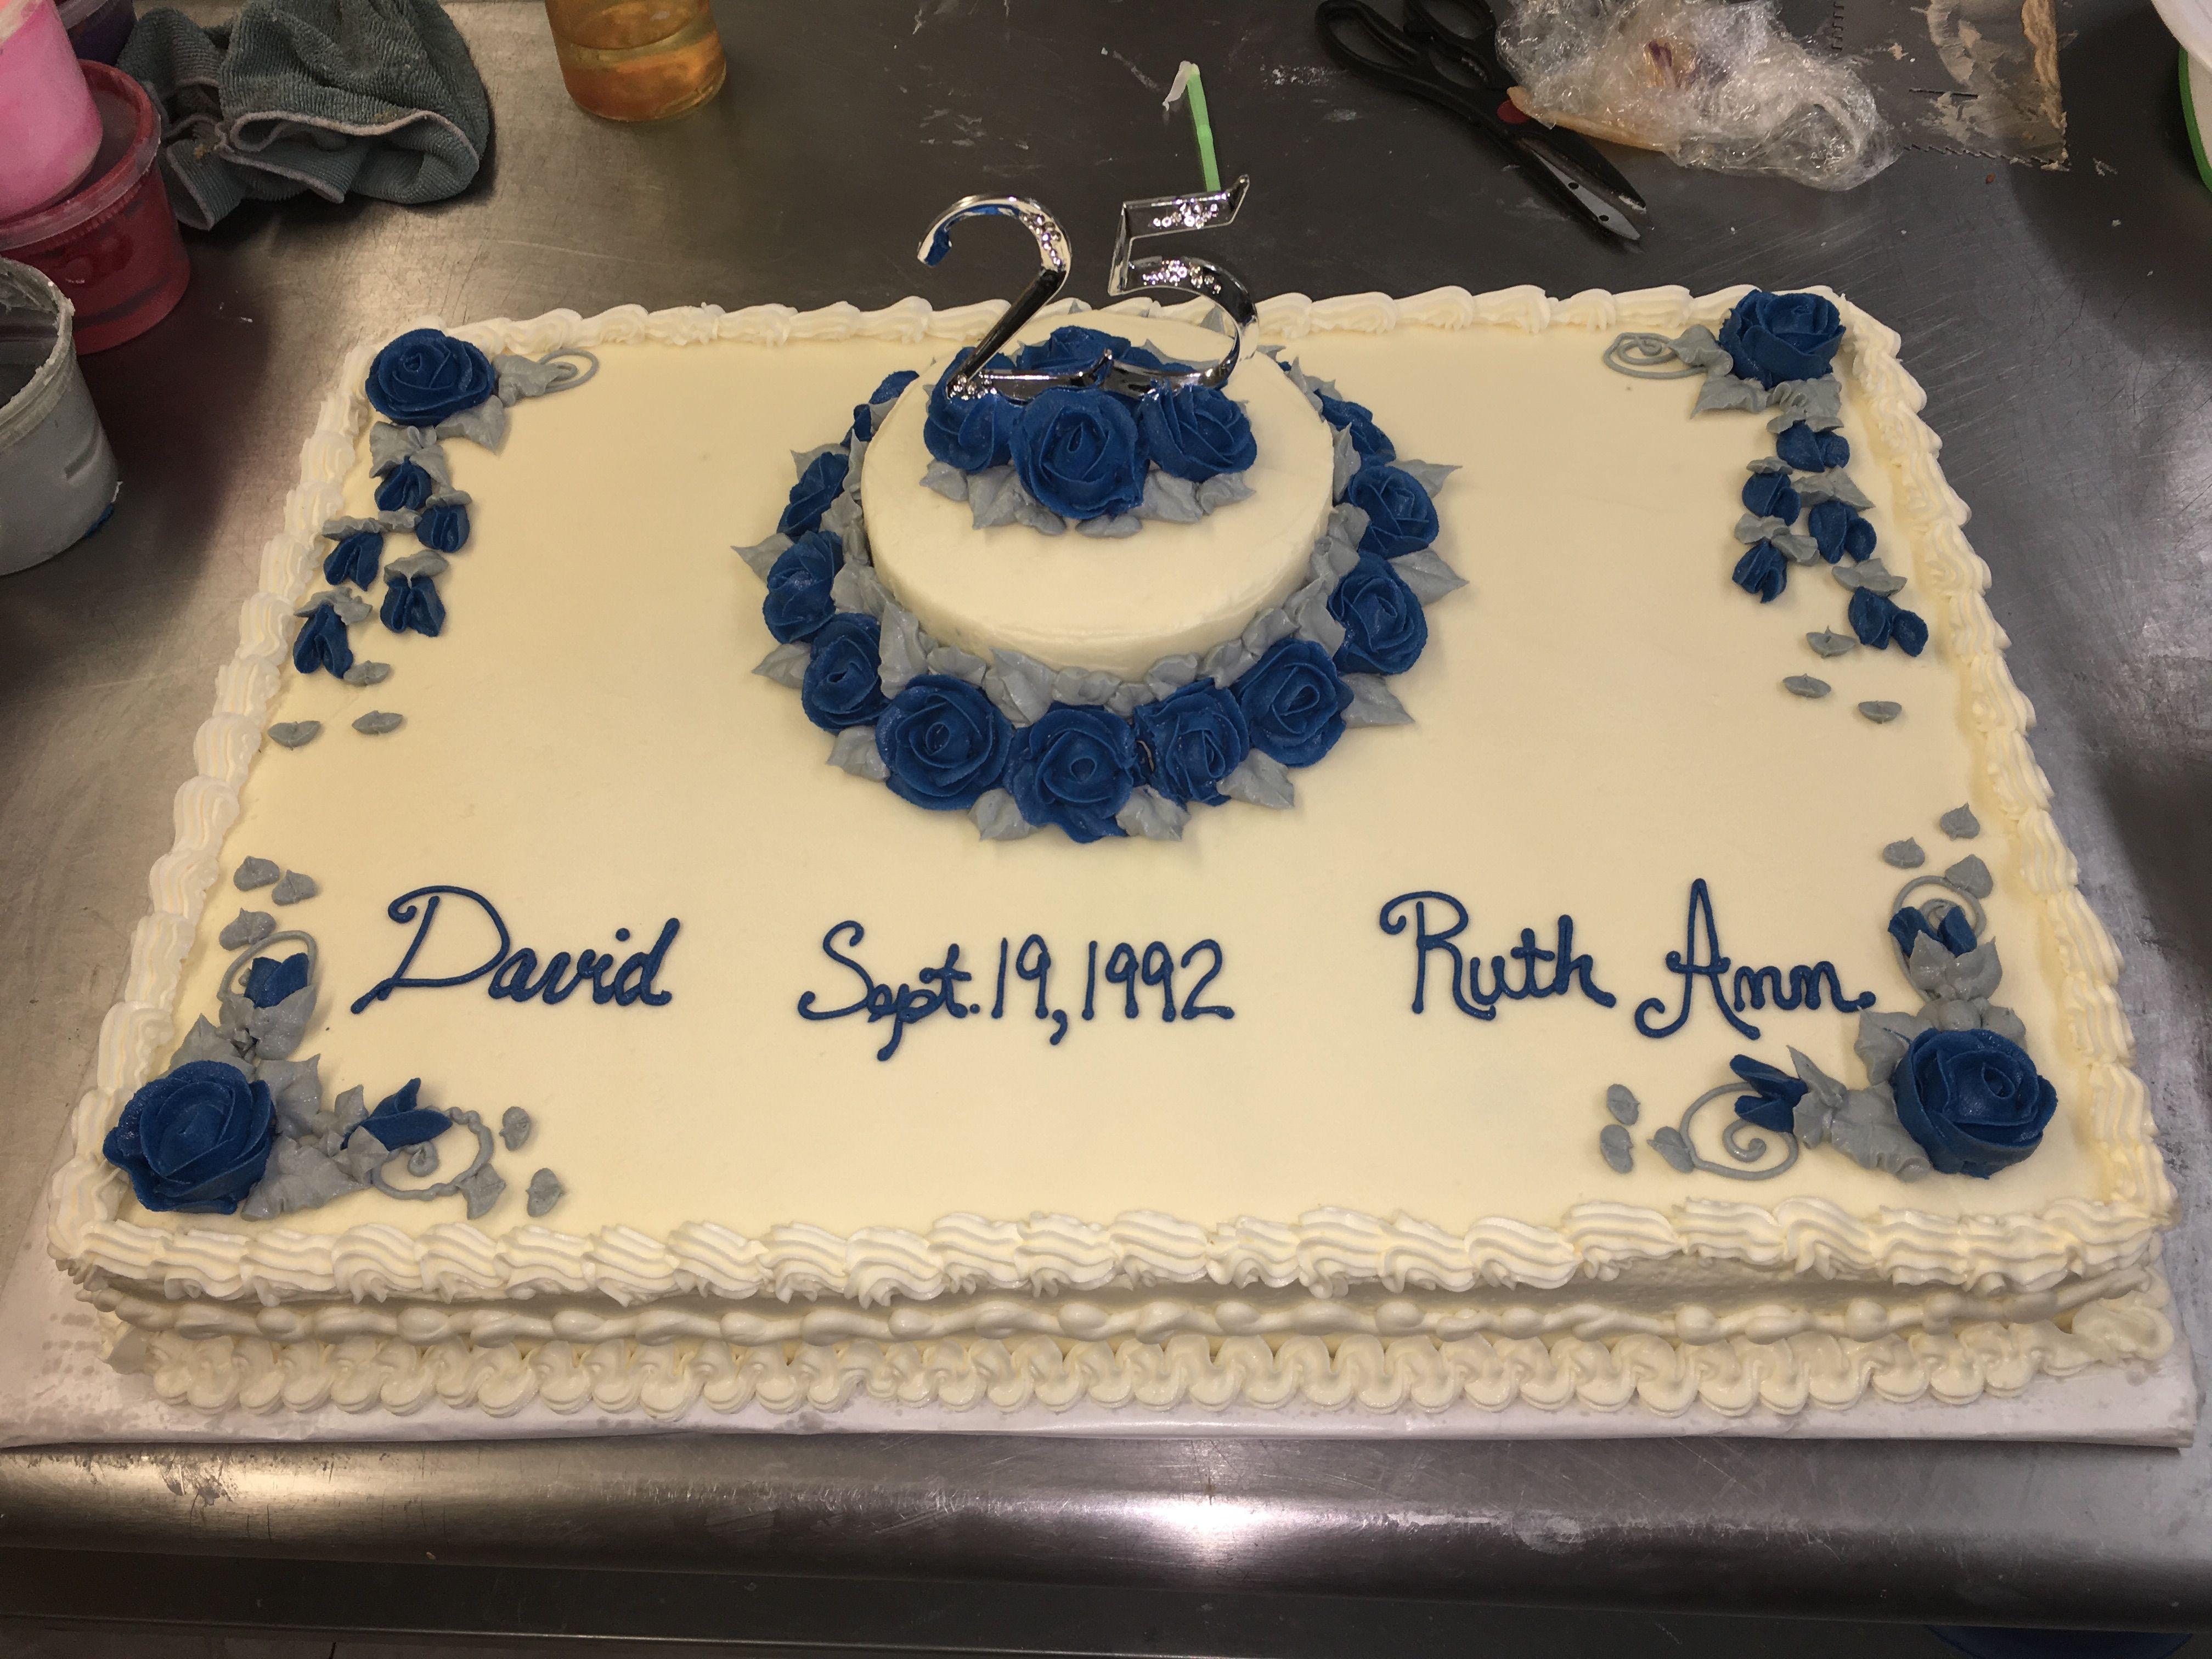 25th wedding anniversary cake, sheet cake, roses and vines ...